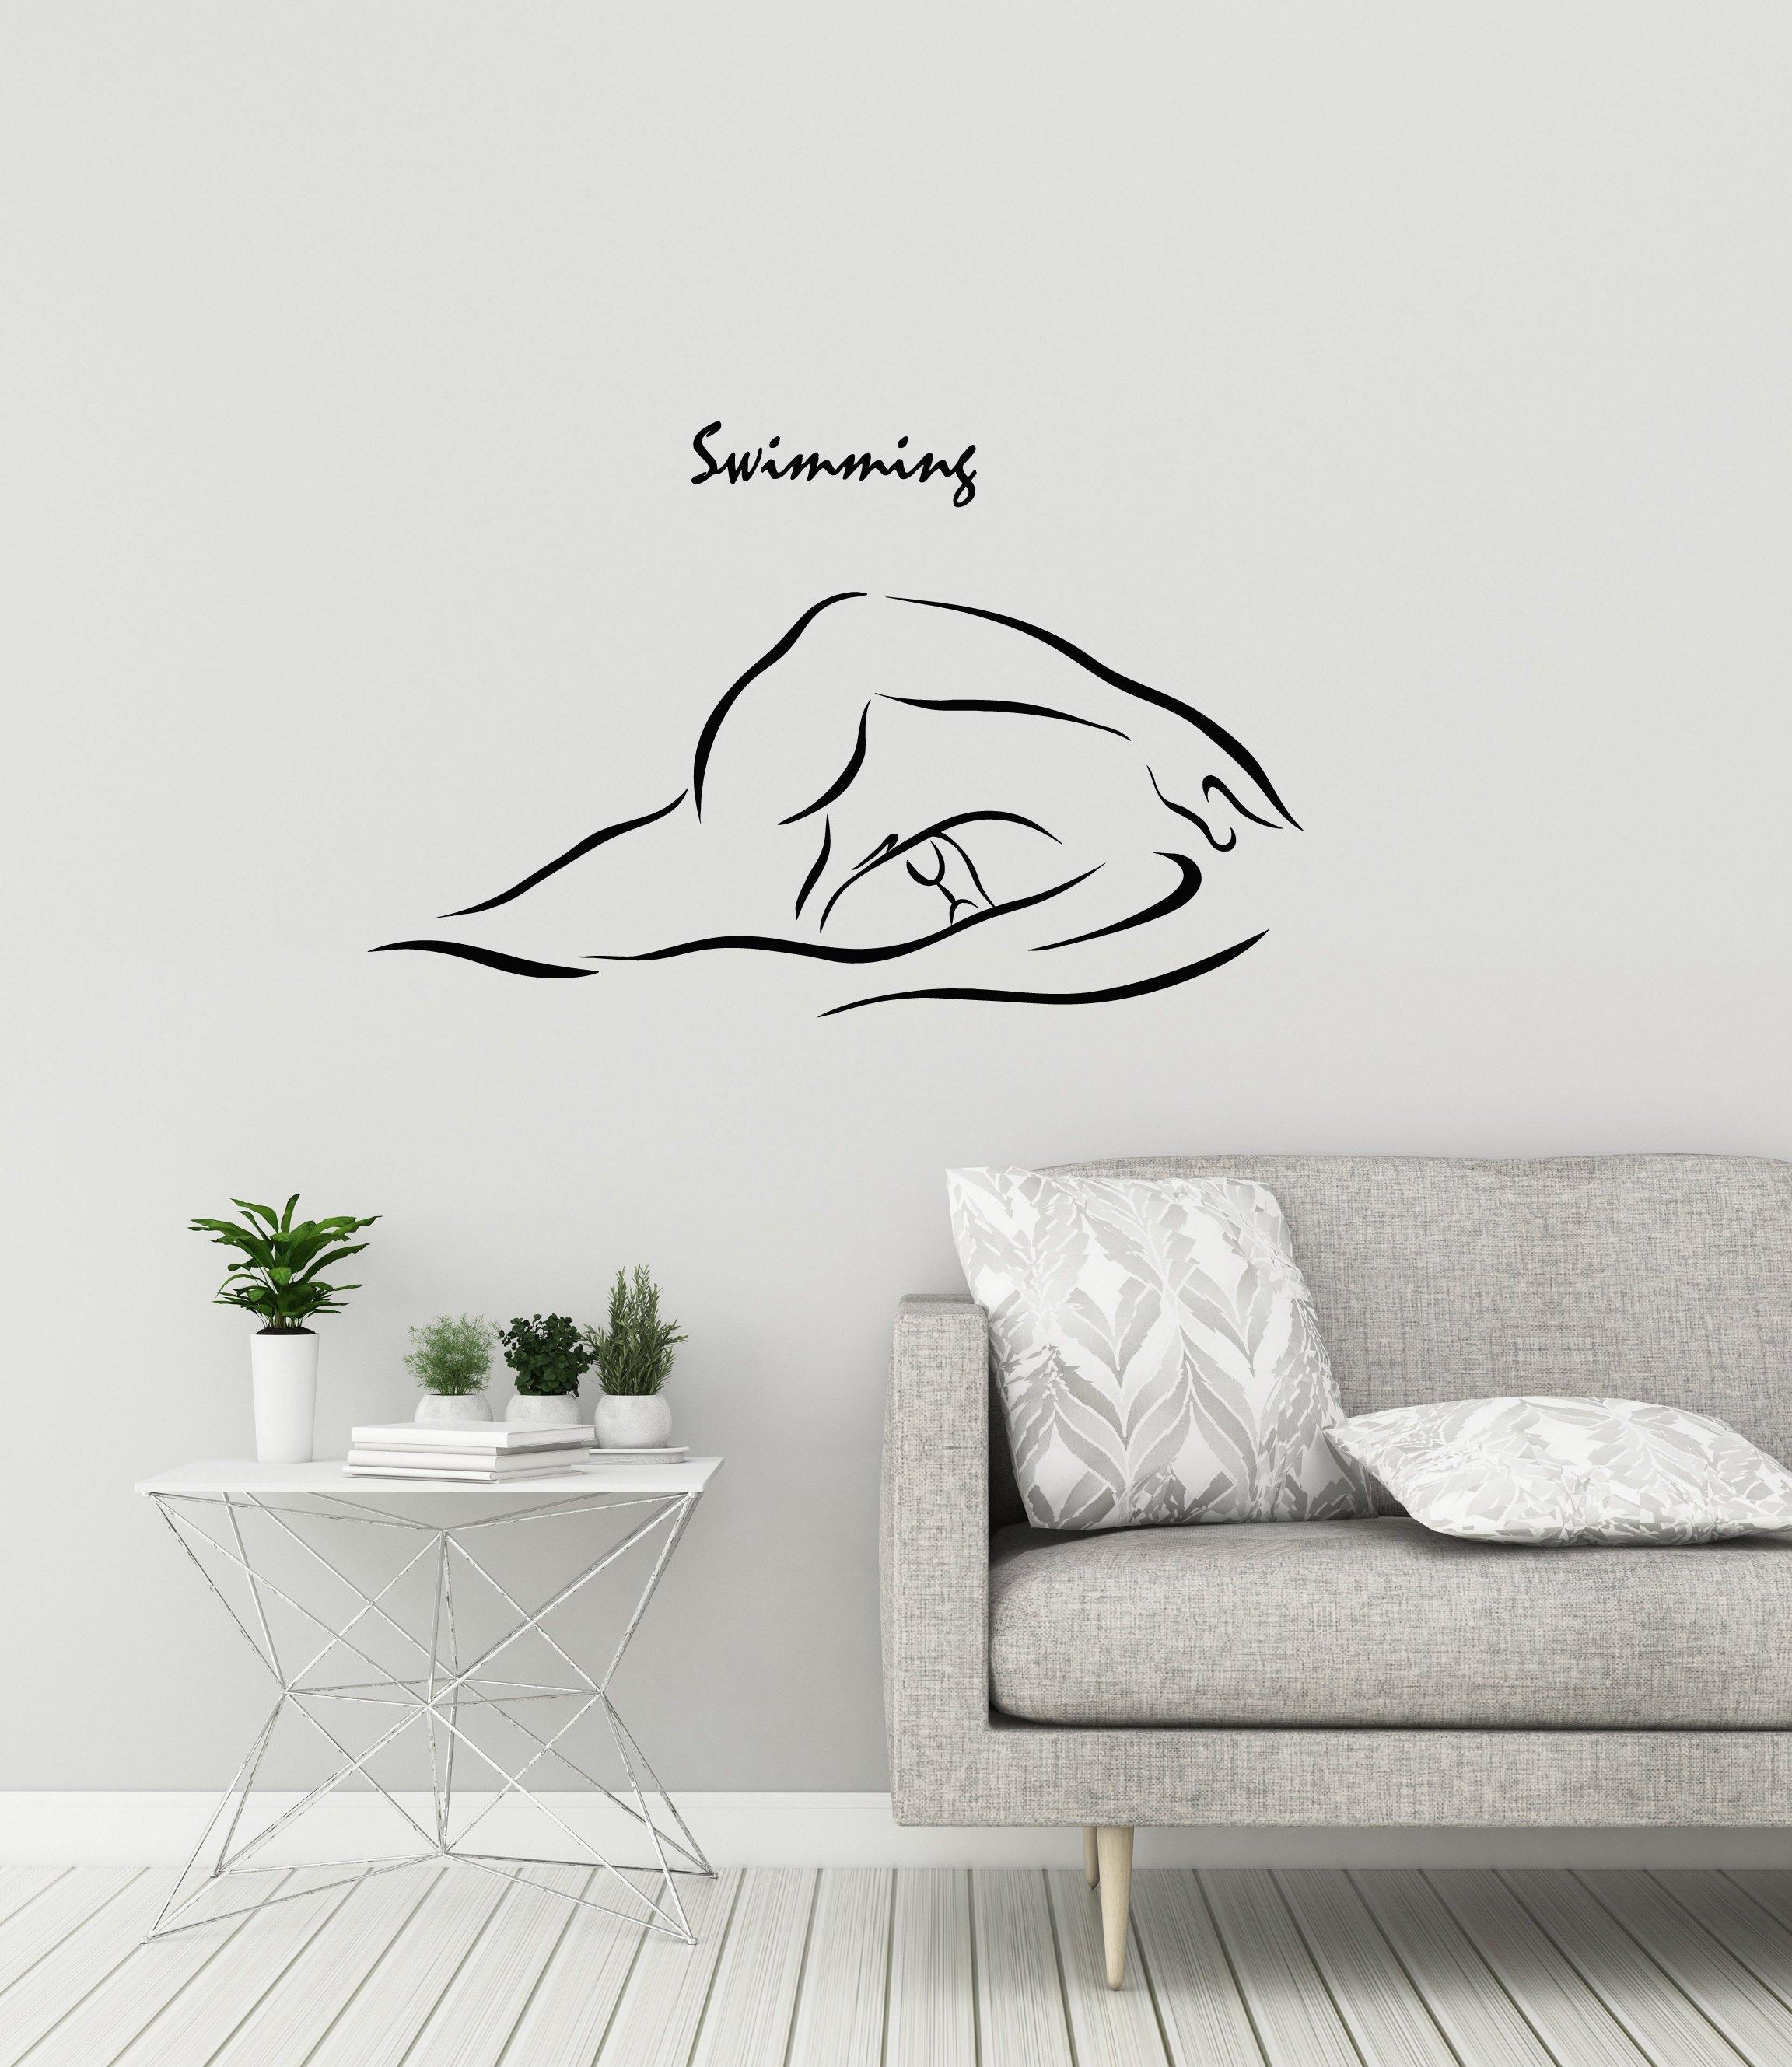 Swimmer Vinyl Wall Decal Swimming Pool Swim Sports School Gym